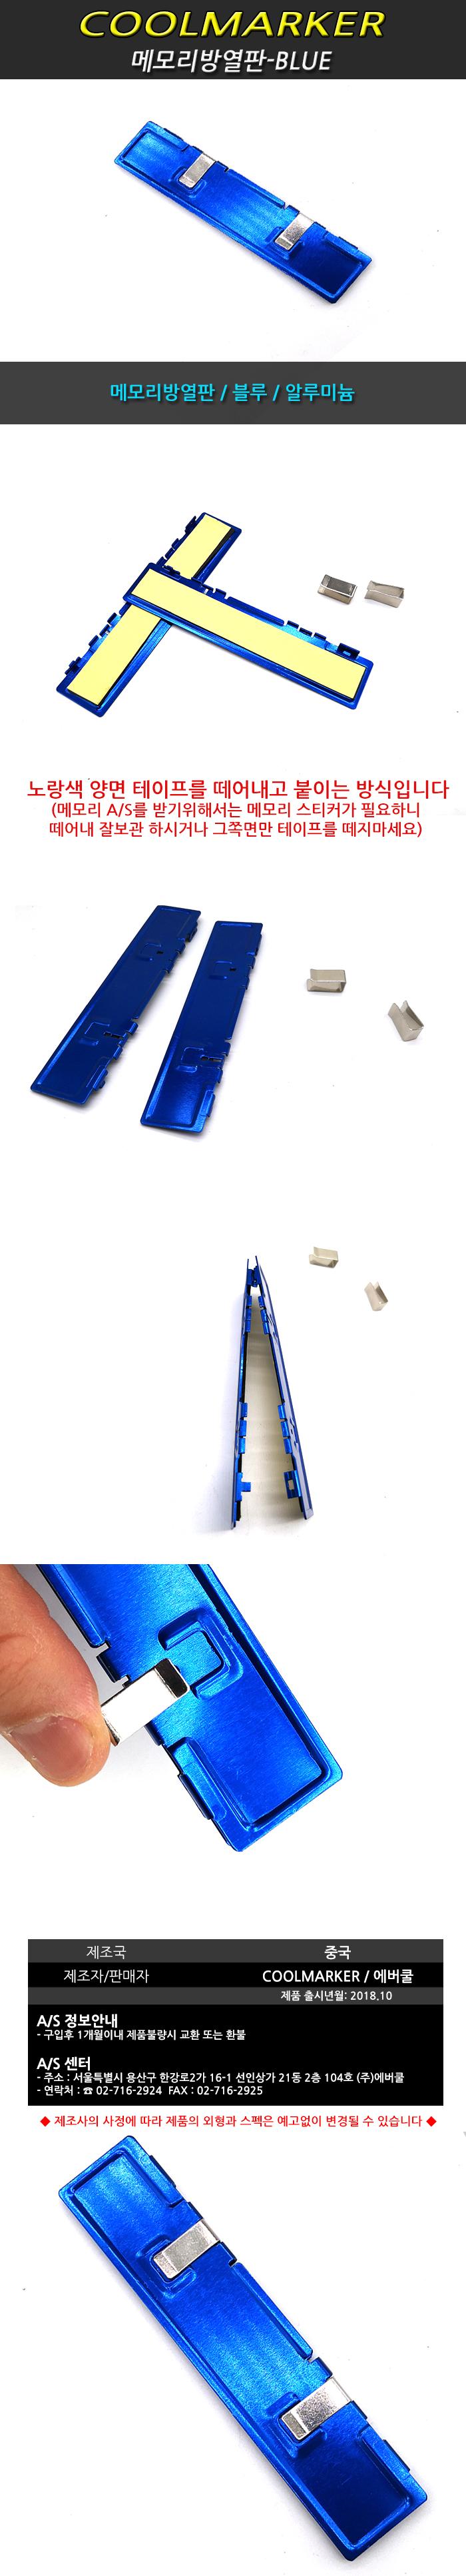 EVERCOOL COOLMARKER 메모리 방열판 (블루)